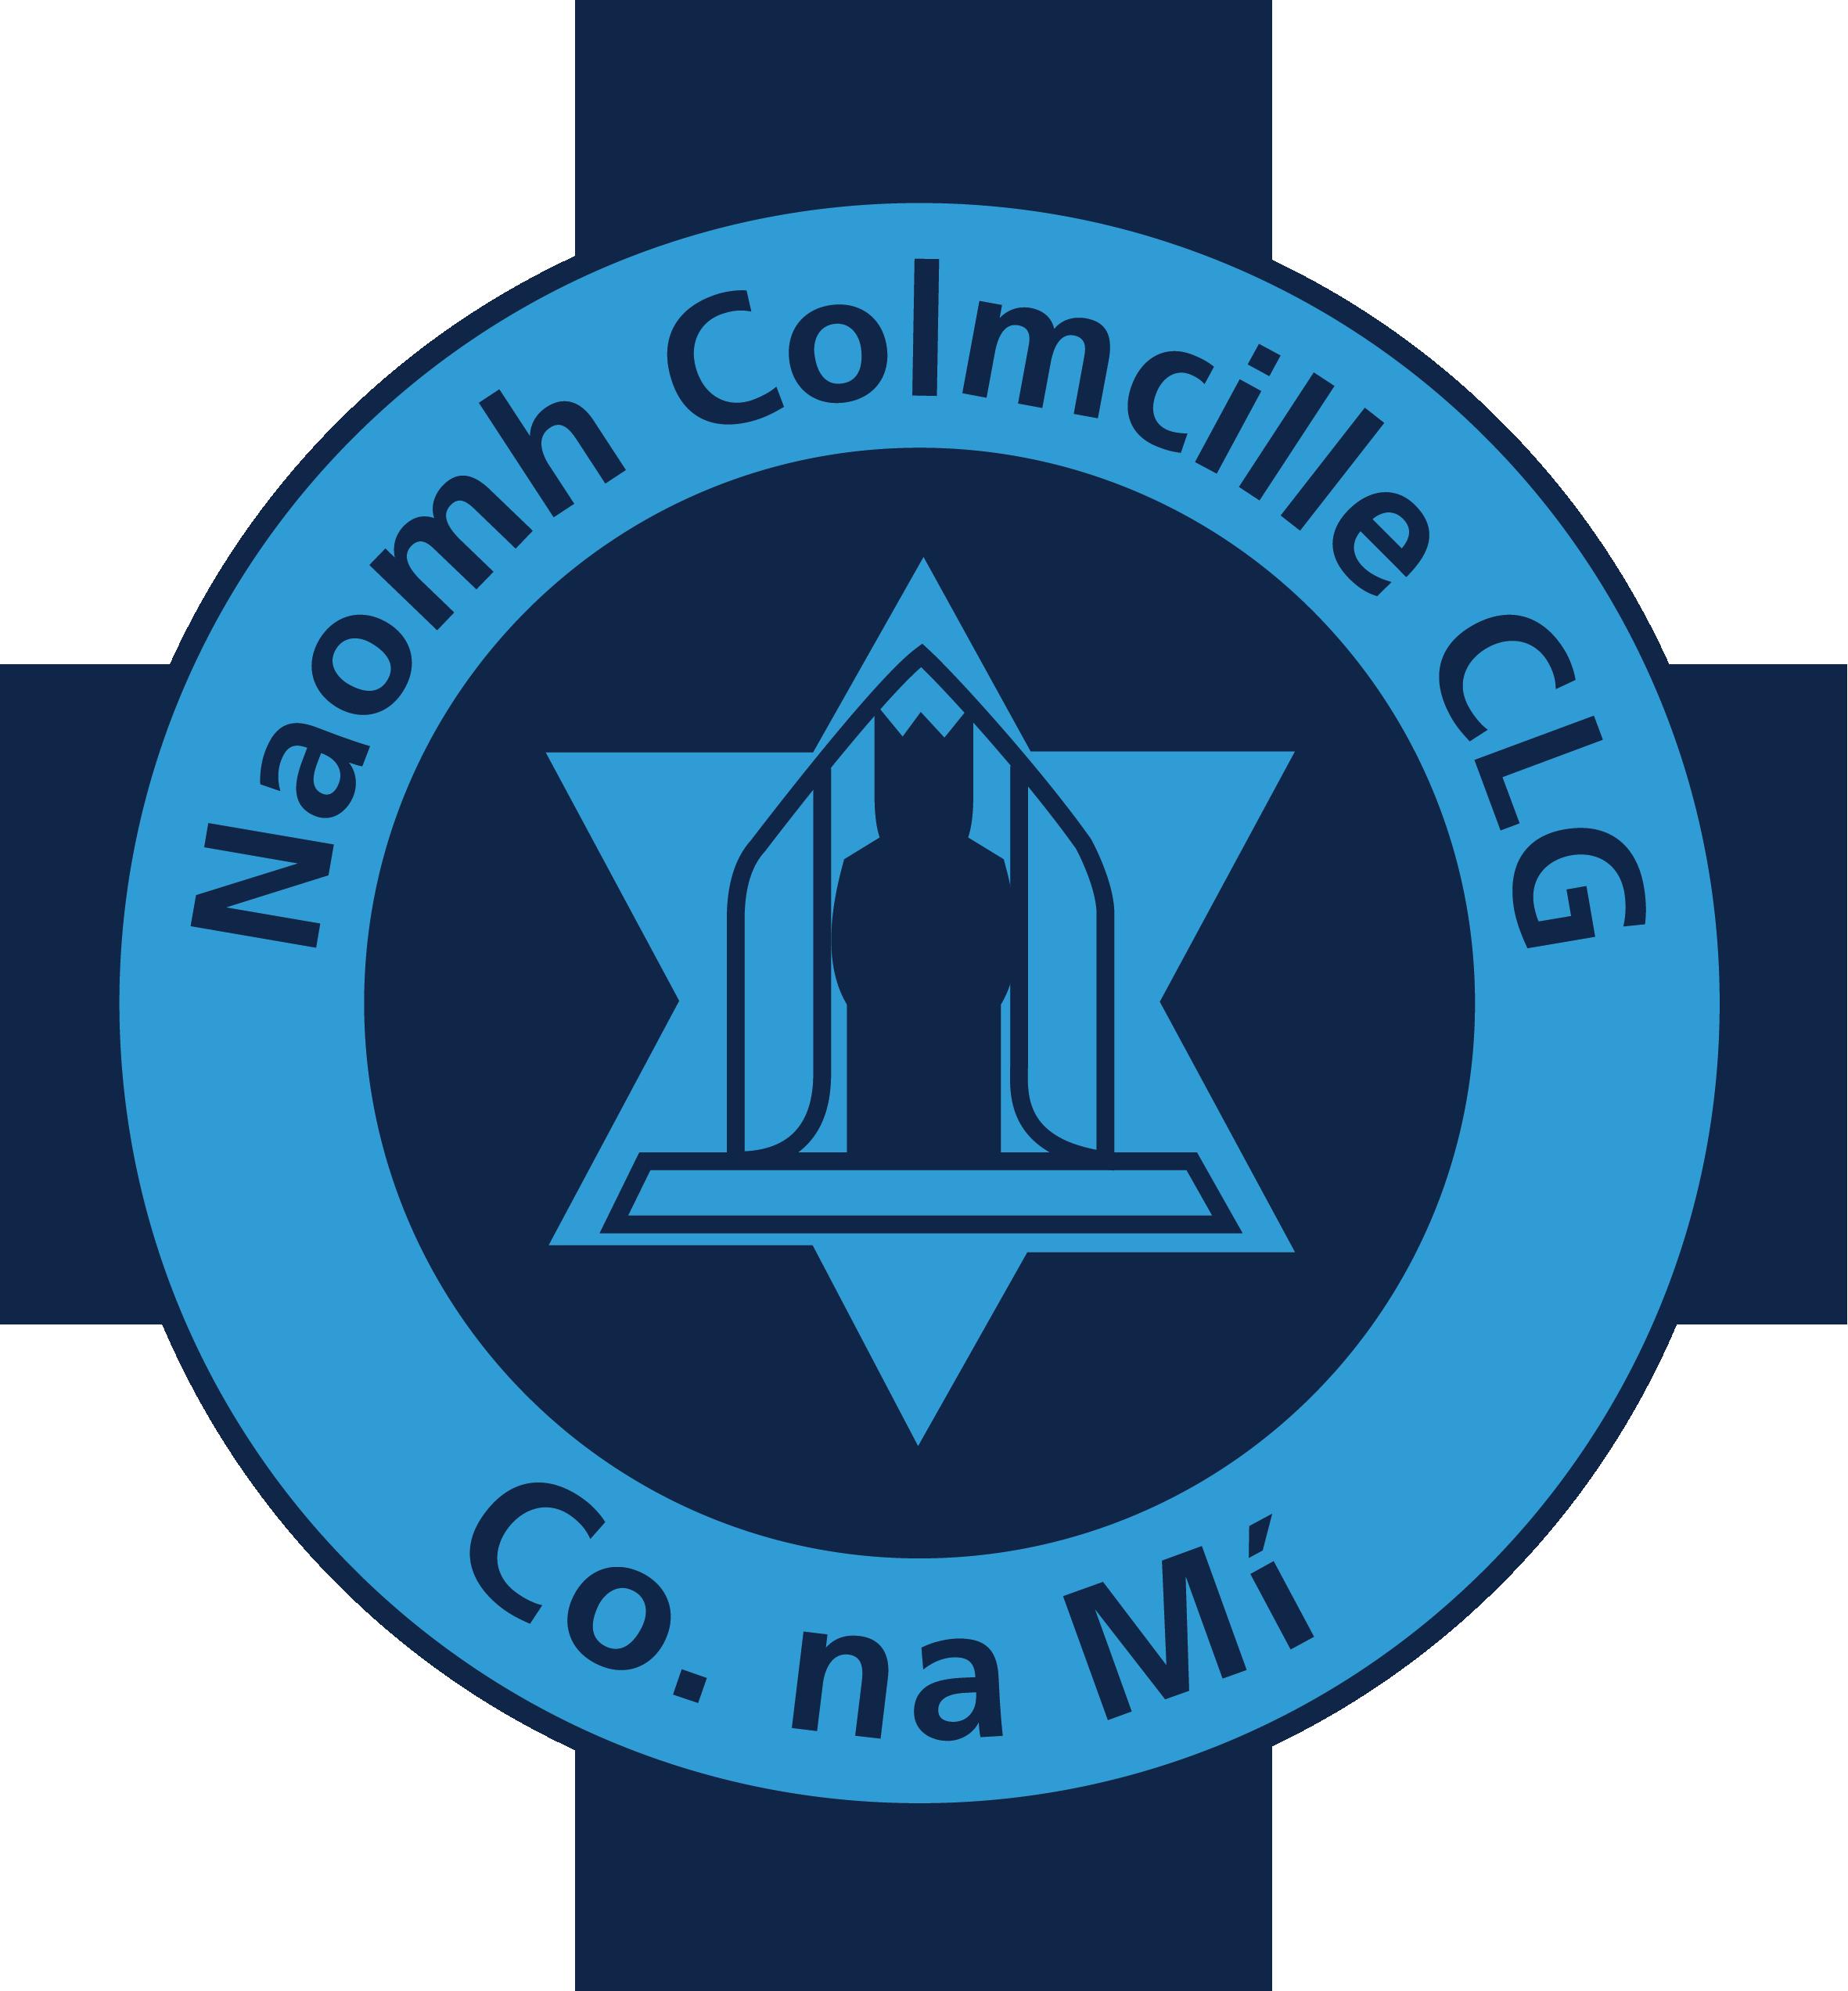 St. Colmcille's